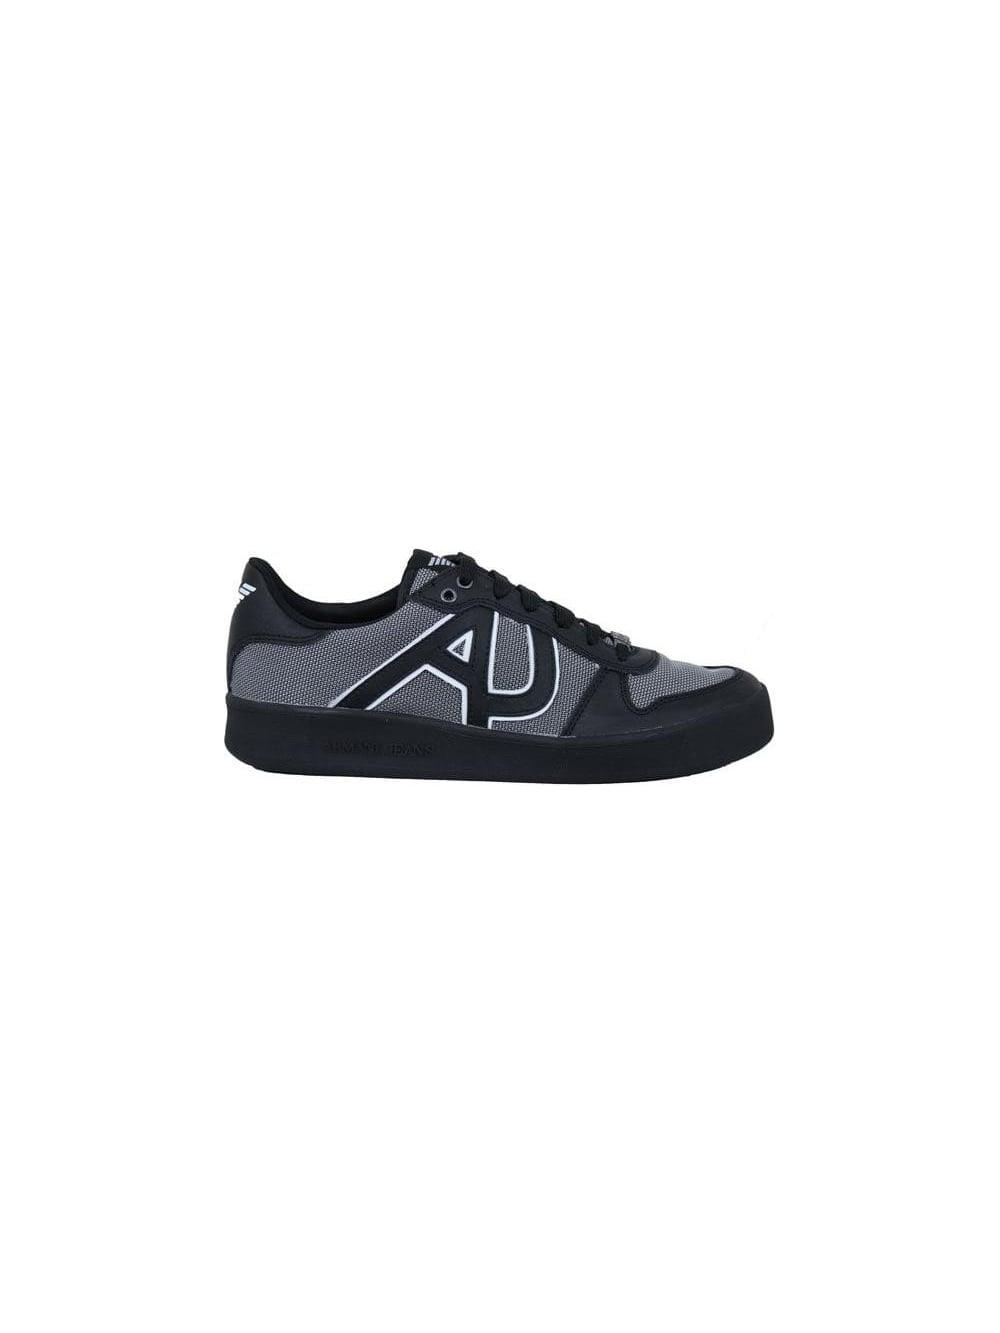 628a8d56 AJ Leather & Mesh Trainer - Black